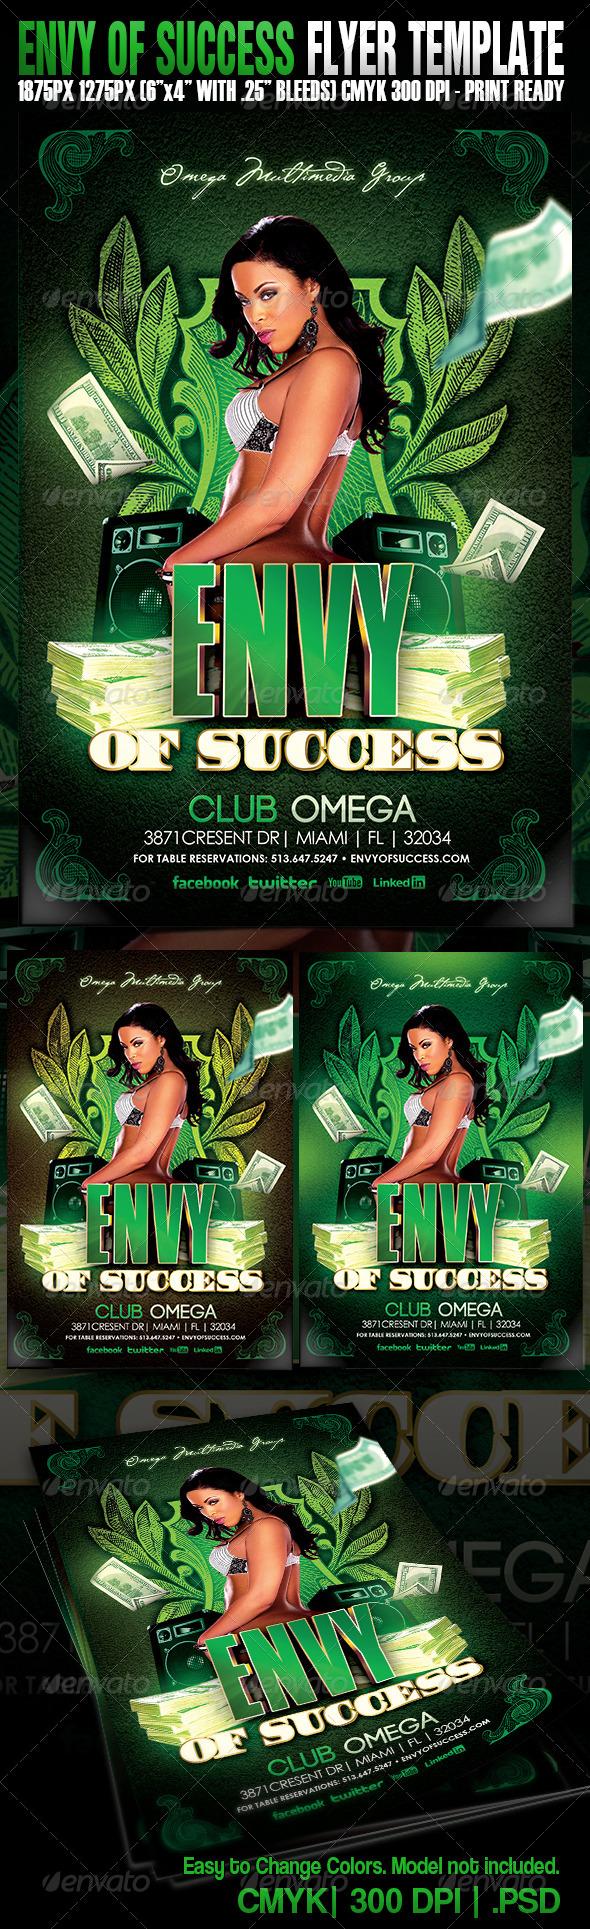 GraphicRiver Envy of Success 4802772